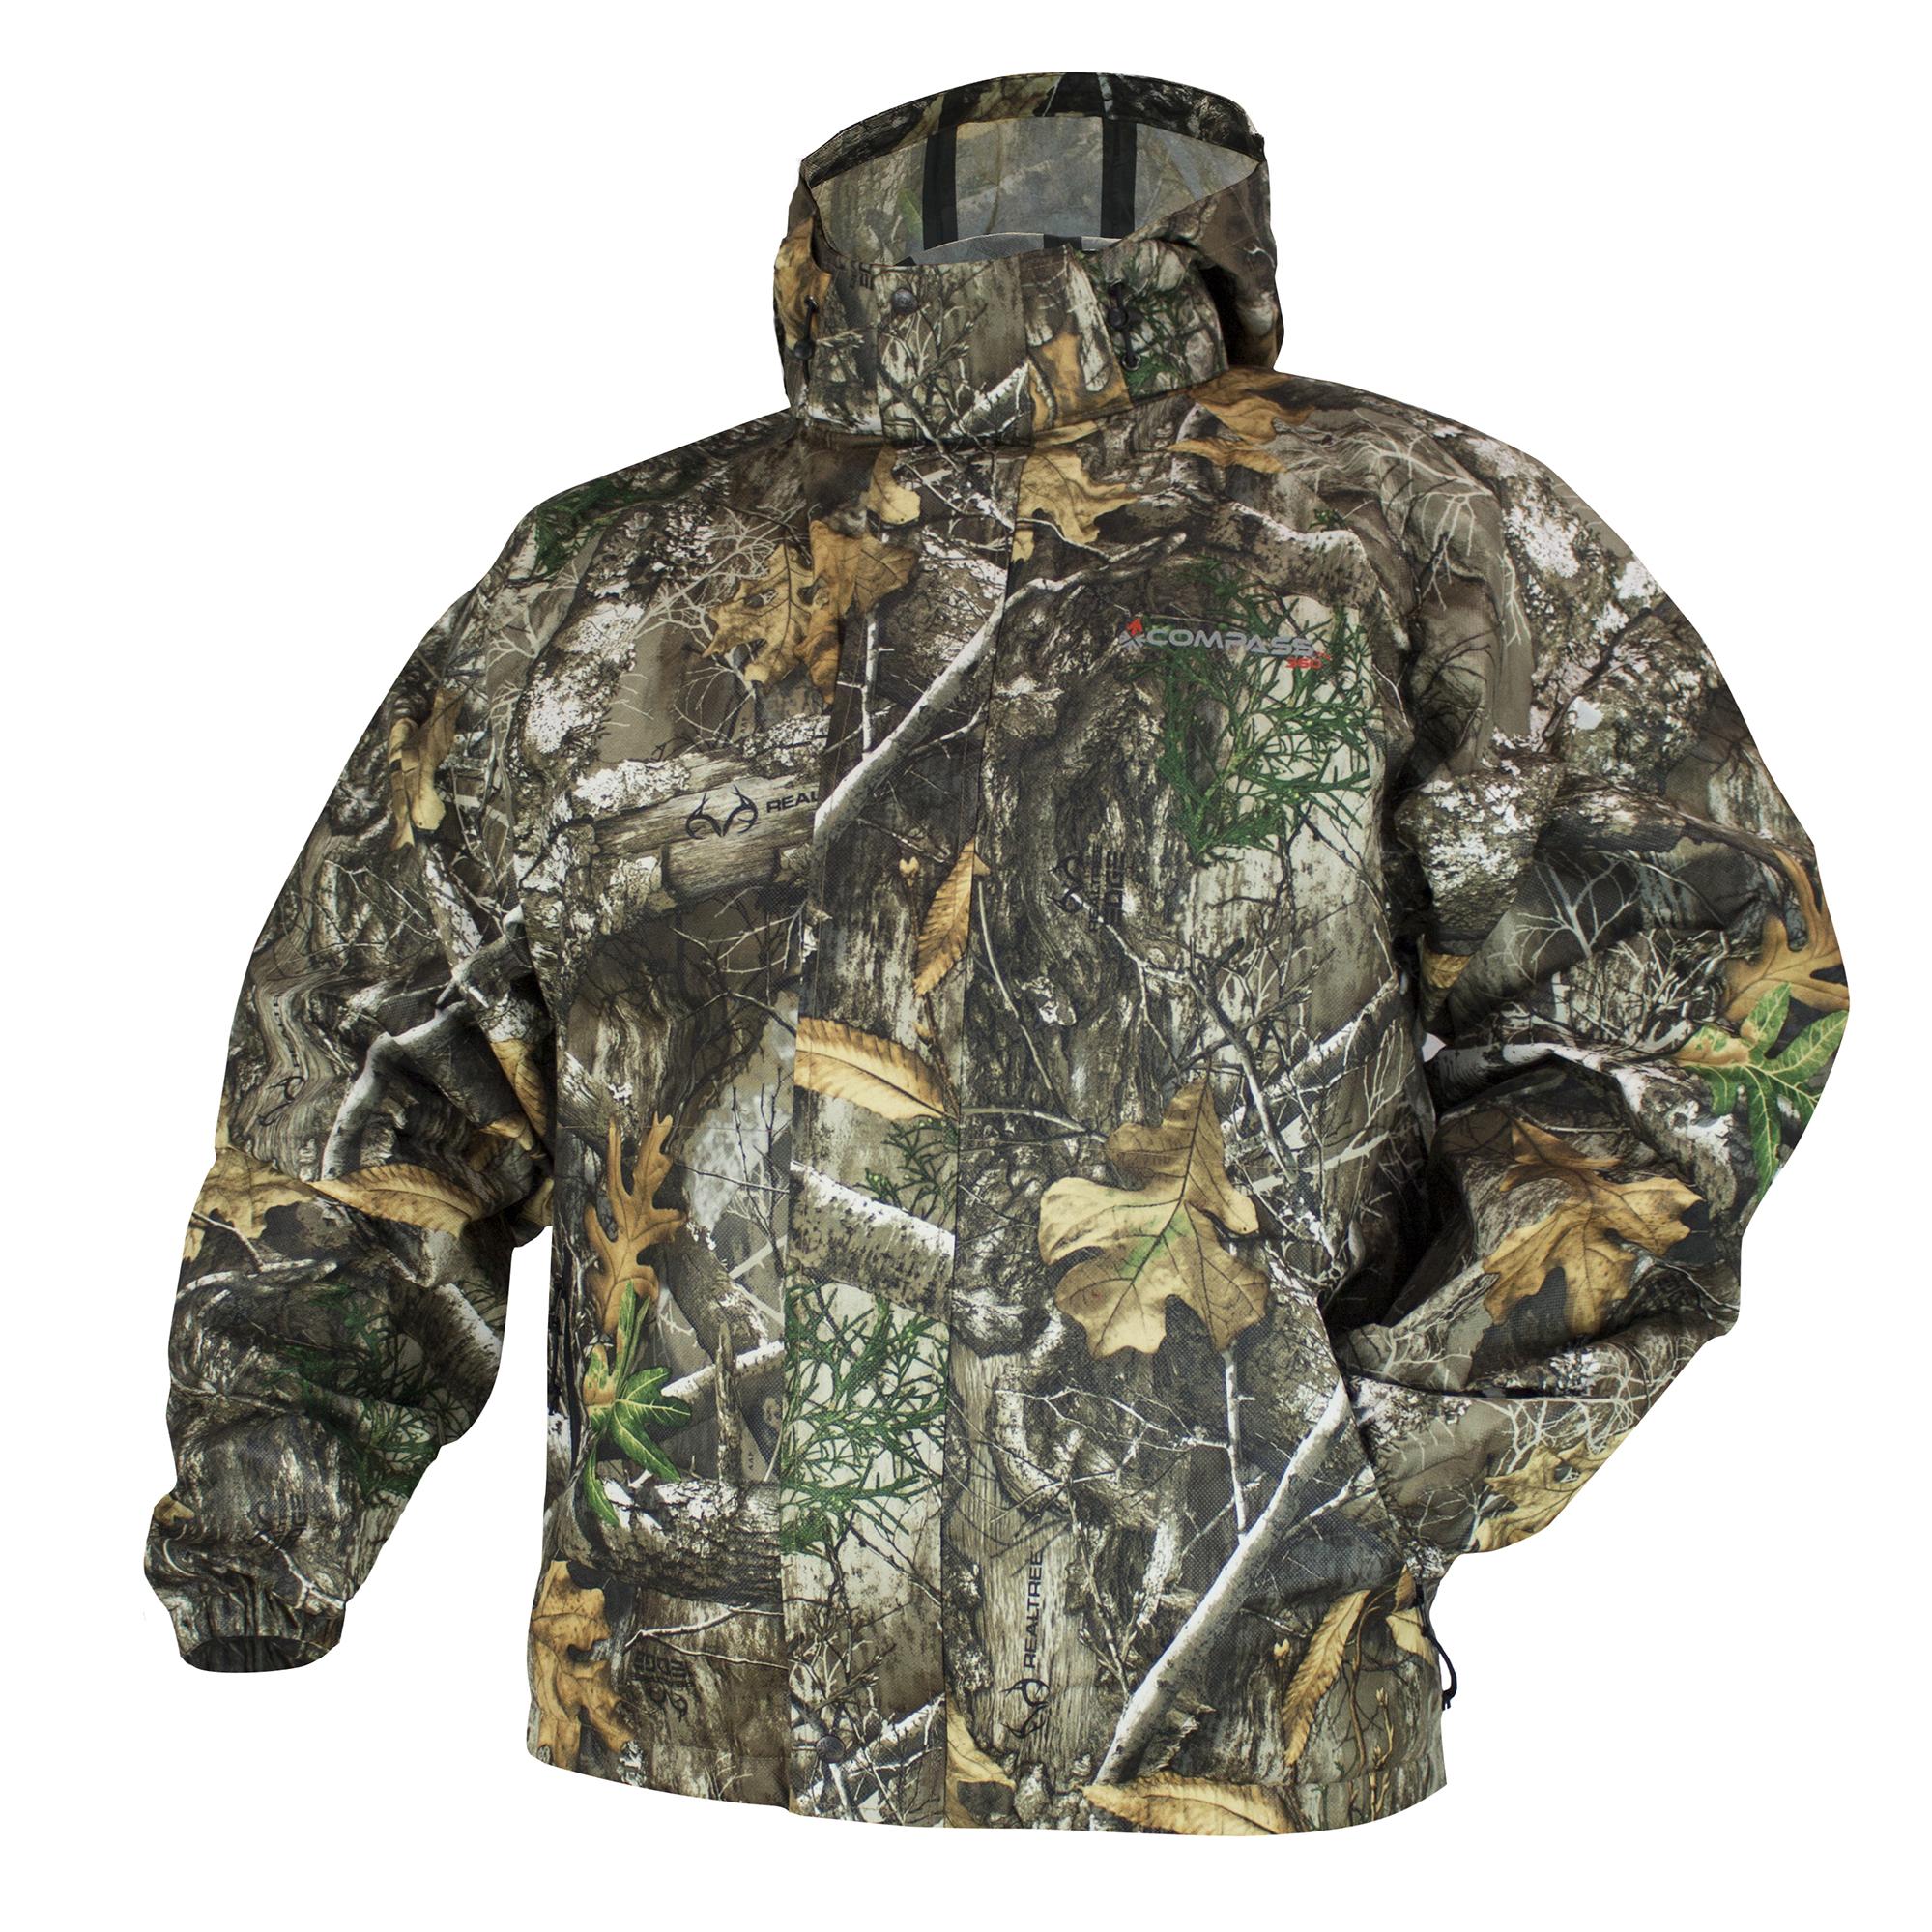 Compass 360 Men's AdvantageTEK Rain Jacket